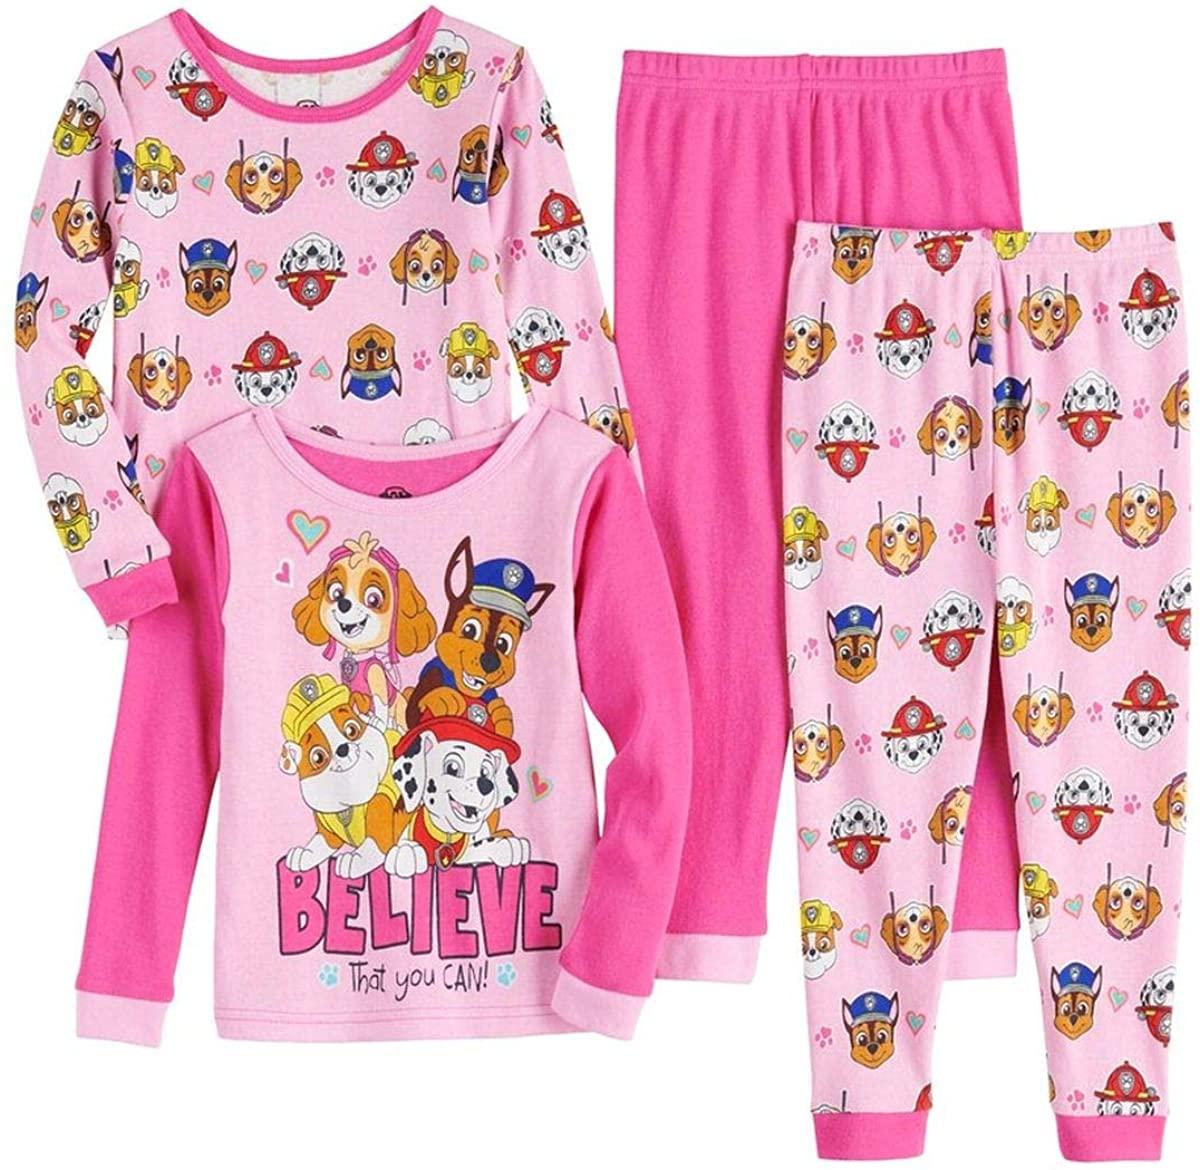 Paw Patrol Skye Believe That You Can 4-Piece Pajama Pants Set